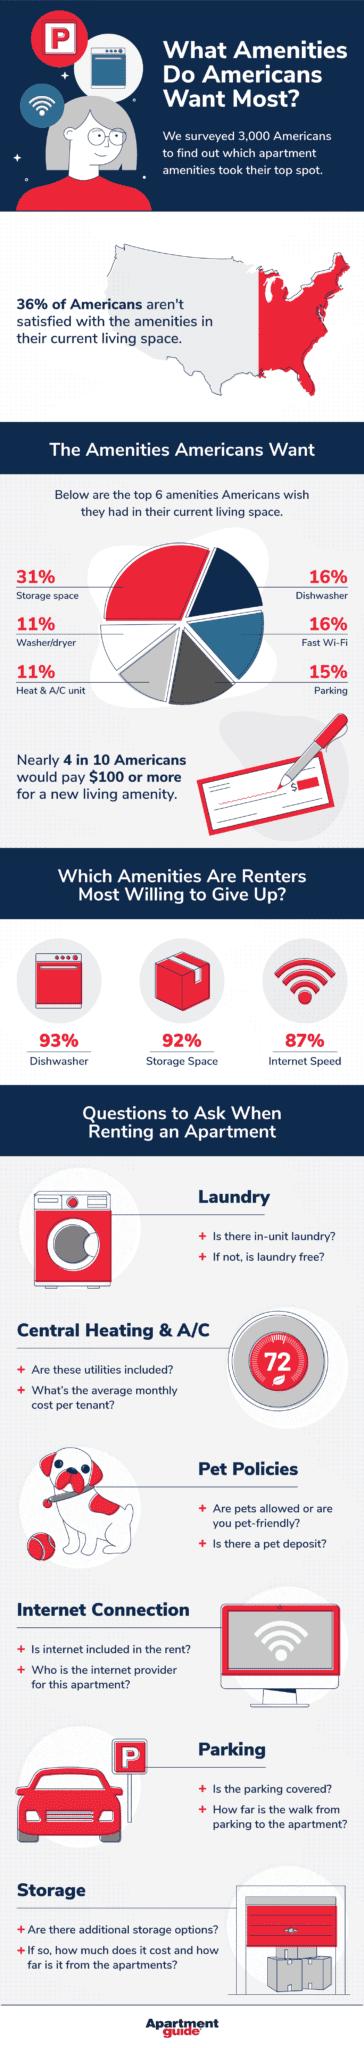 apartment amenities survey infographic